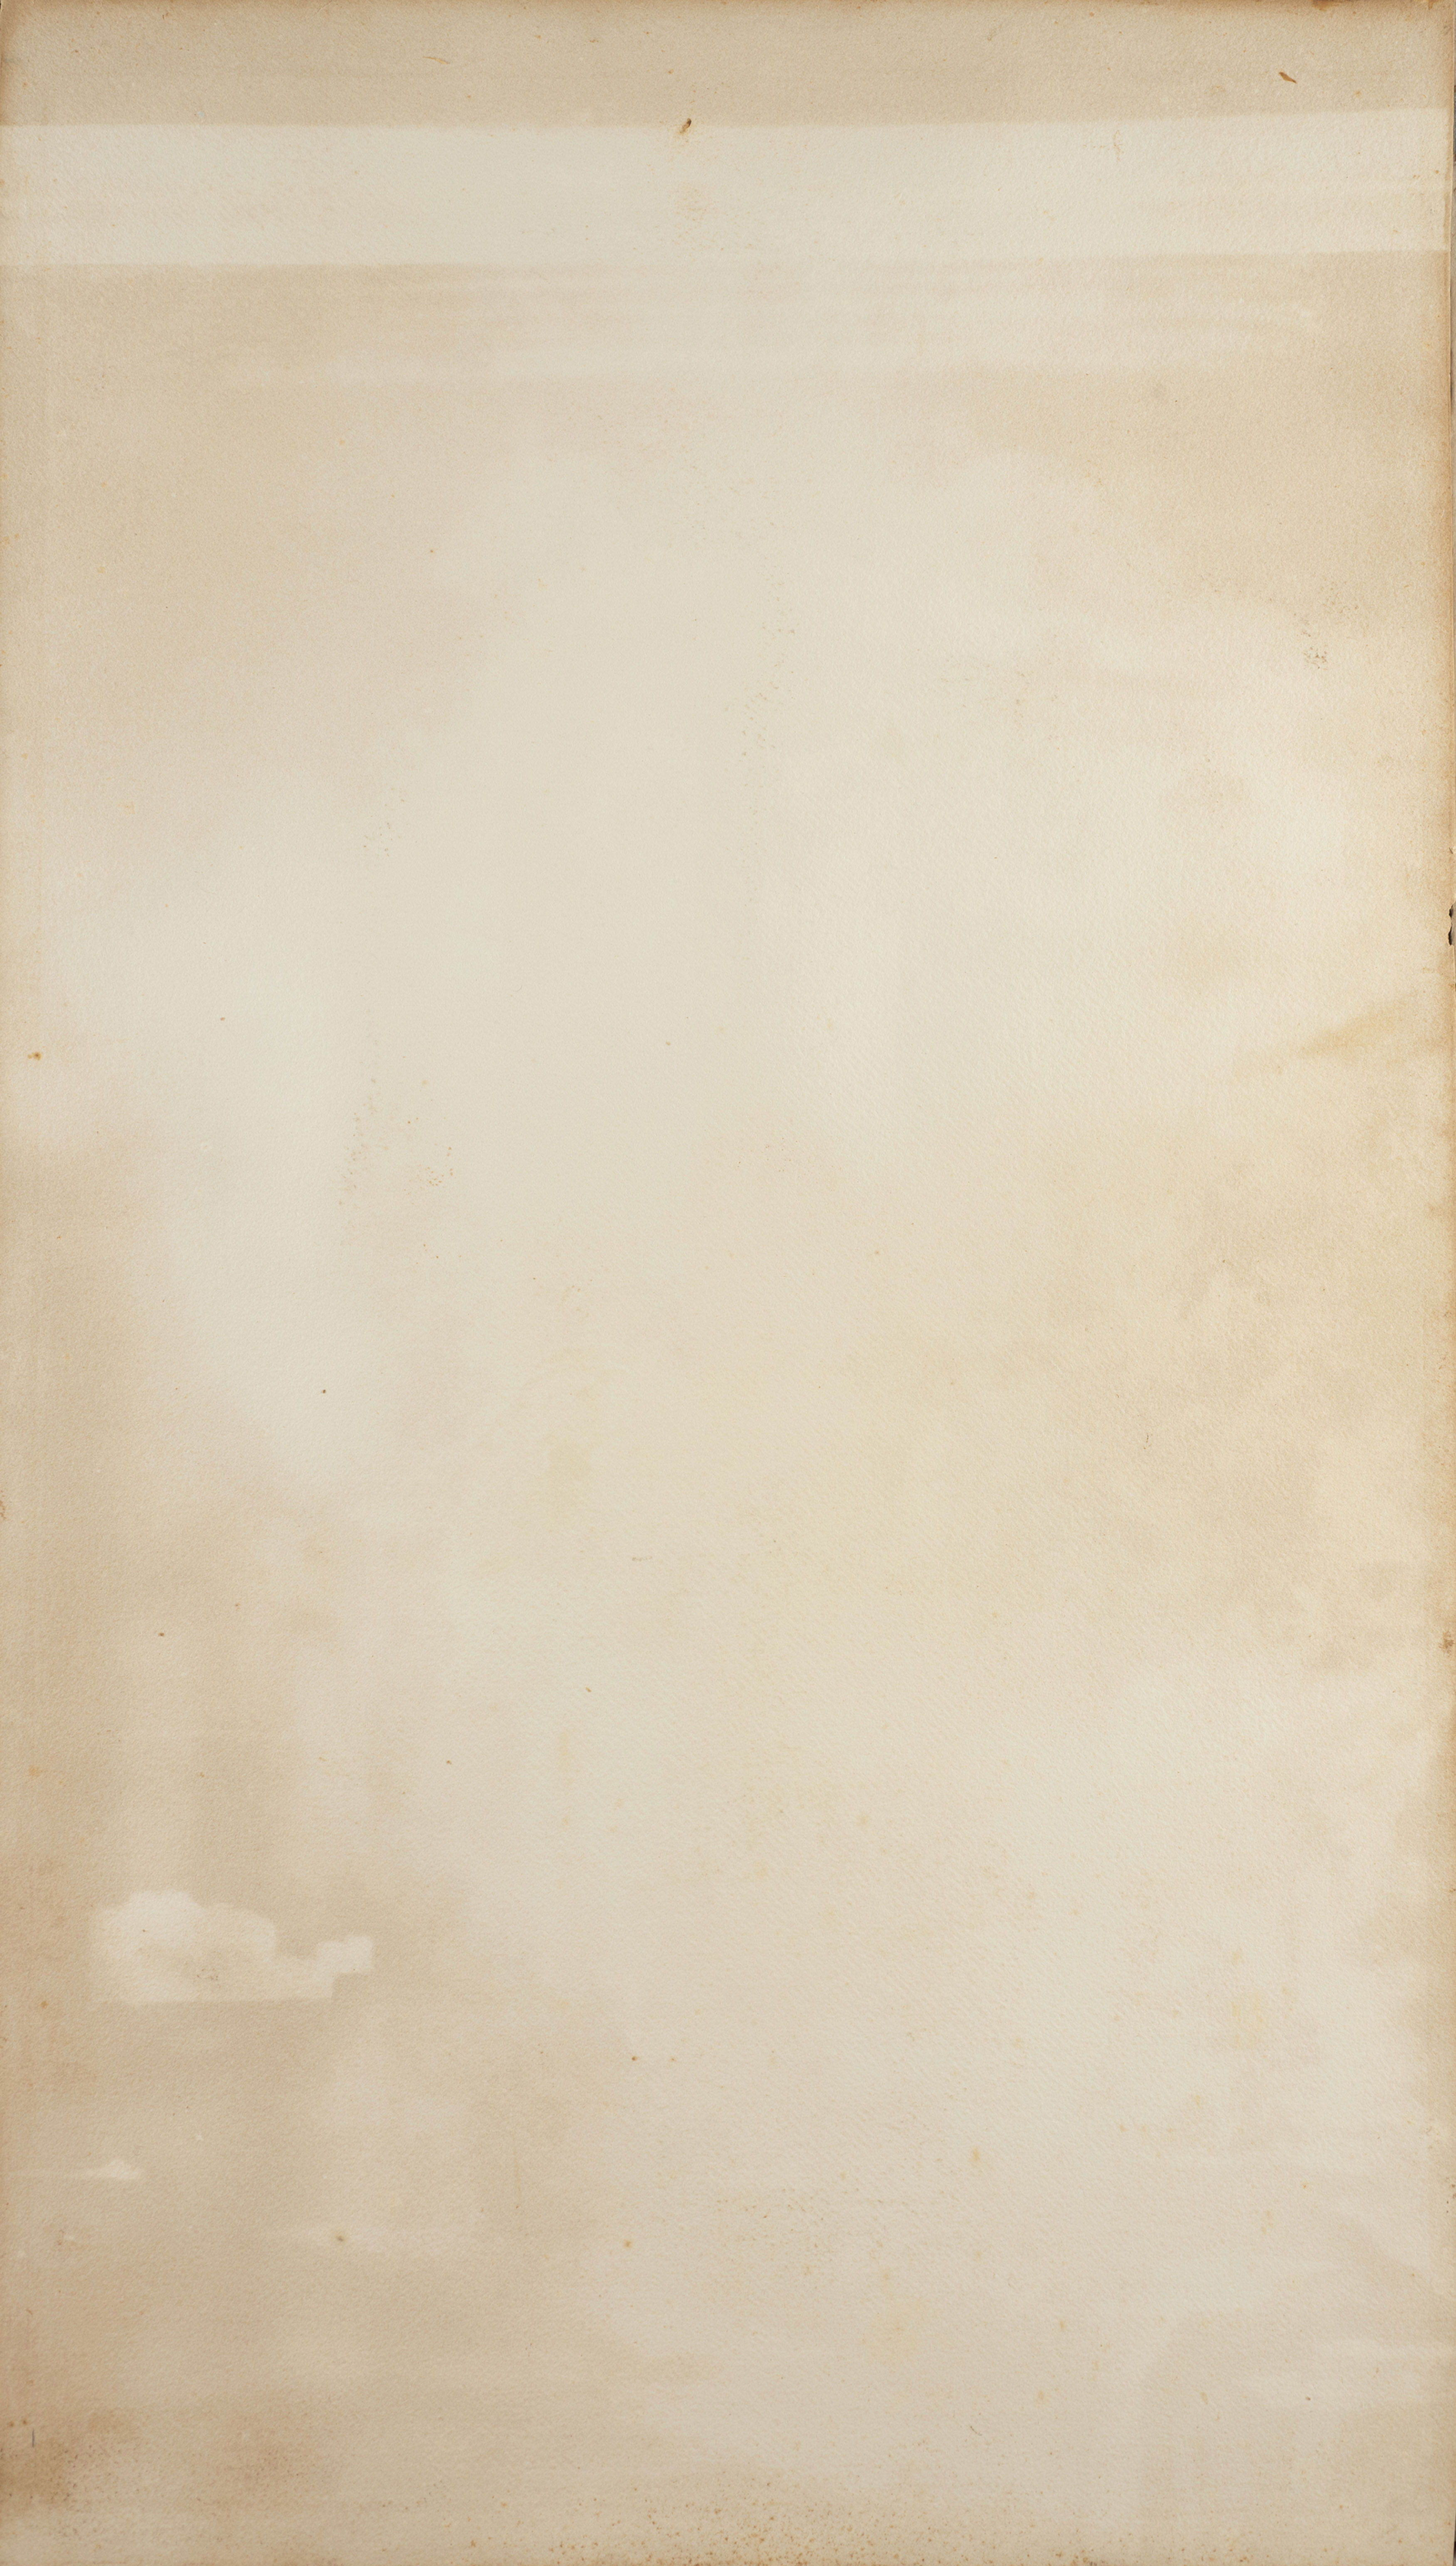 FILIPPO ANIVITTI - Image 2 of 4